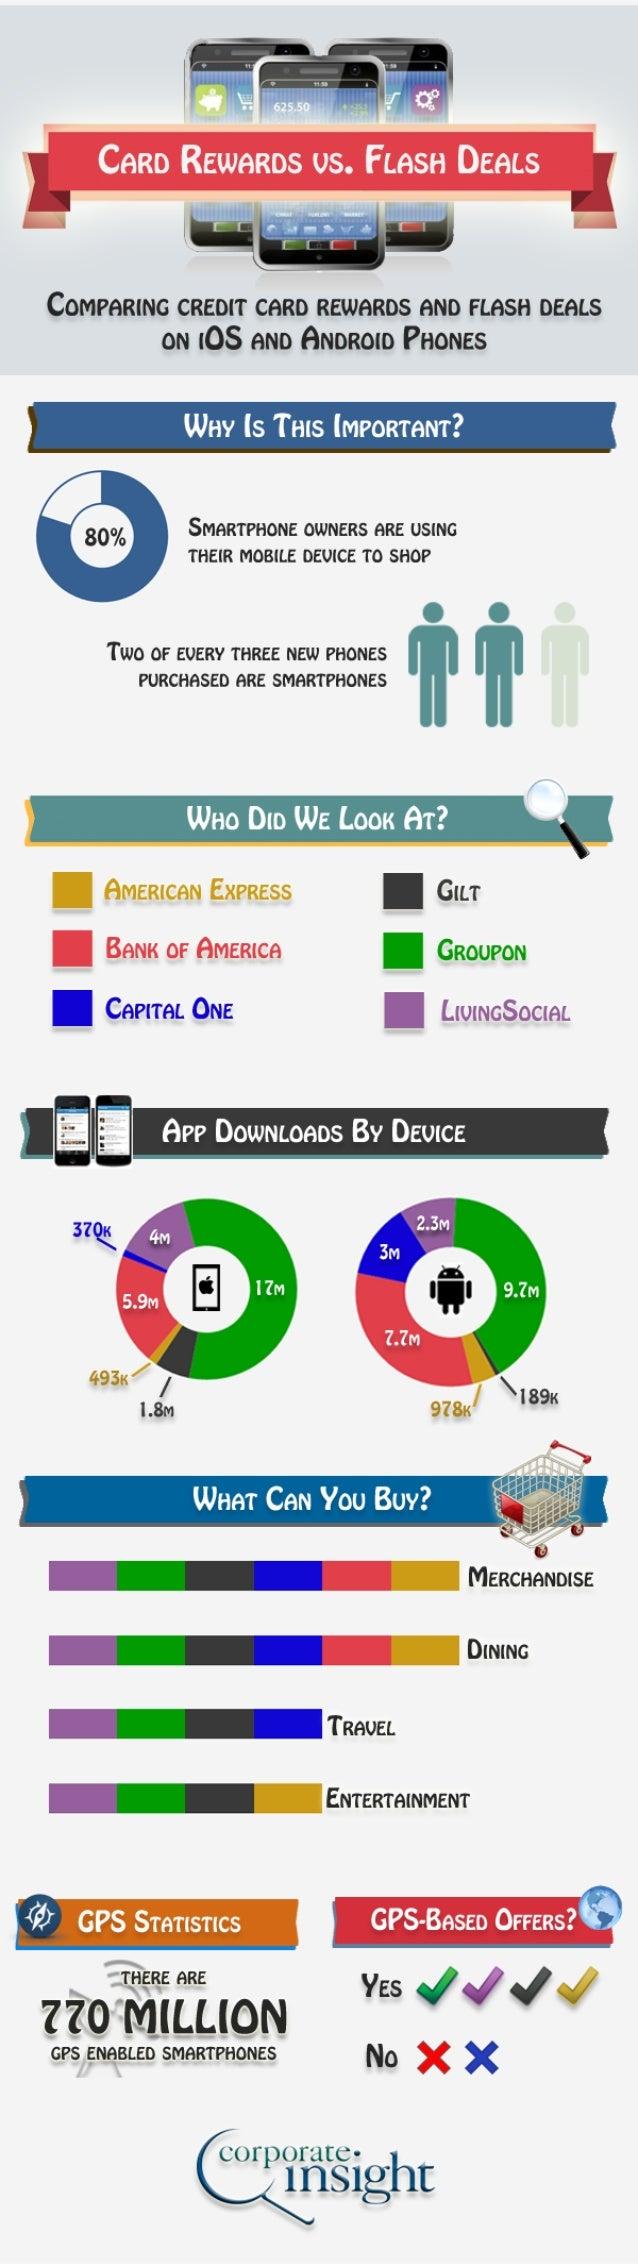 April 2013 Mobile Infographic: Mobile Card Rewards vs. Flash Deals